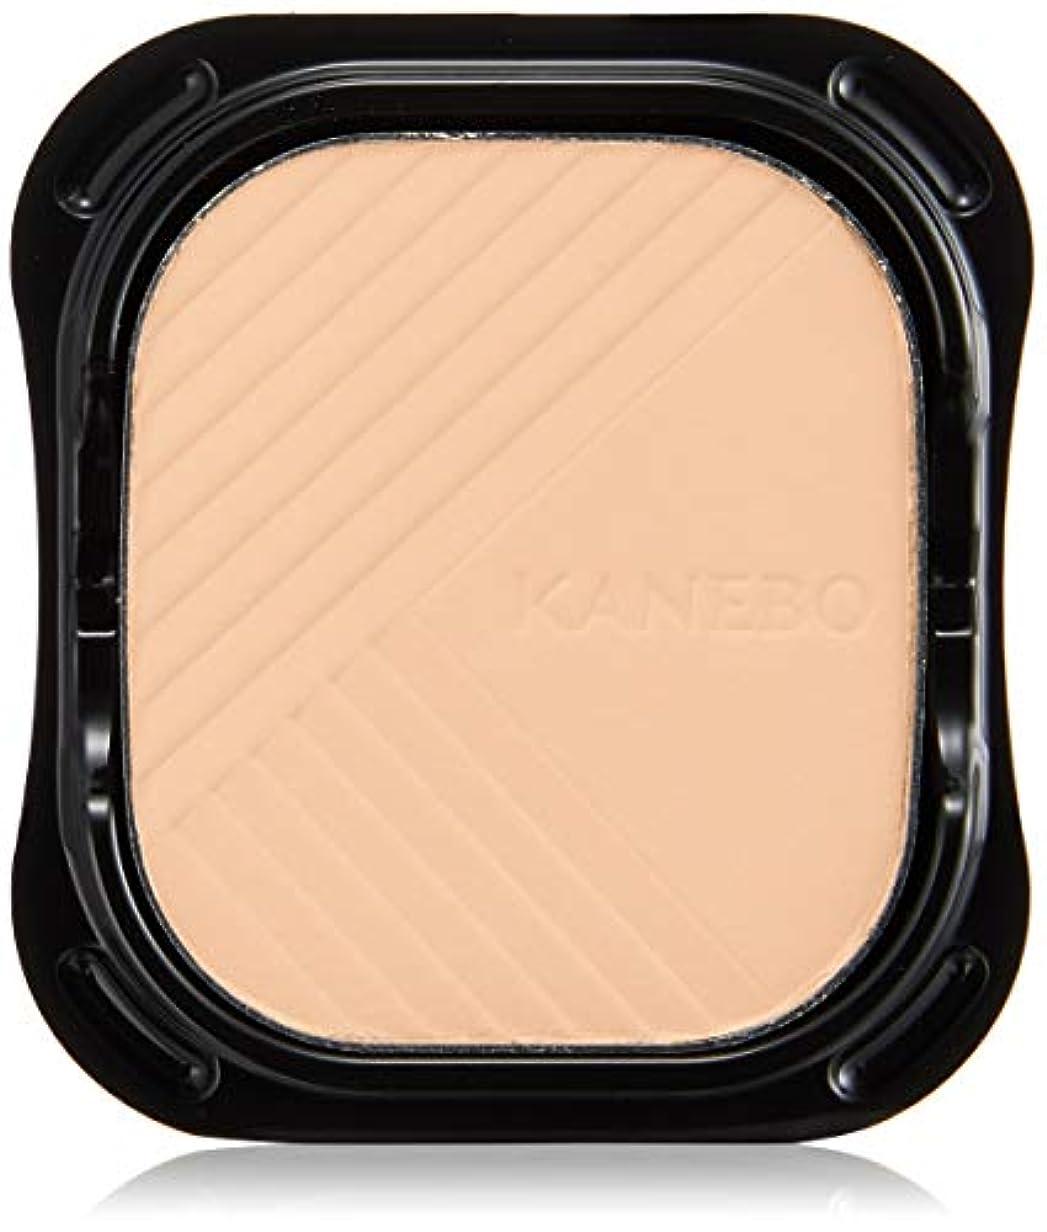 KANEBO(カネボウ) カネボウ ラスターパウダーファンデーション オークルC SPF6/PA++ ファンデーション(パクト)